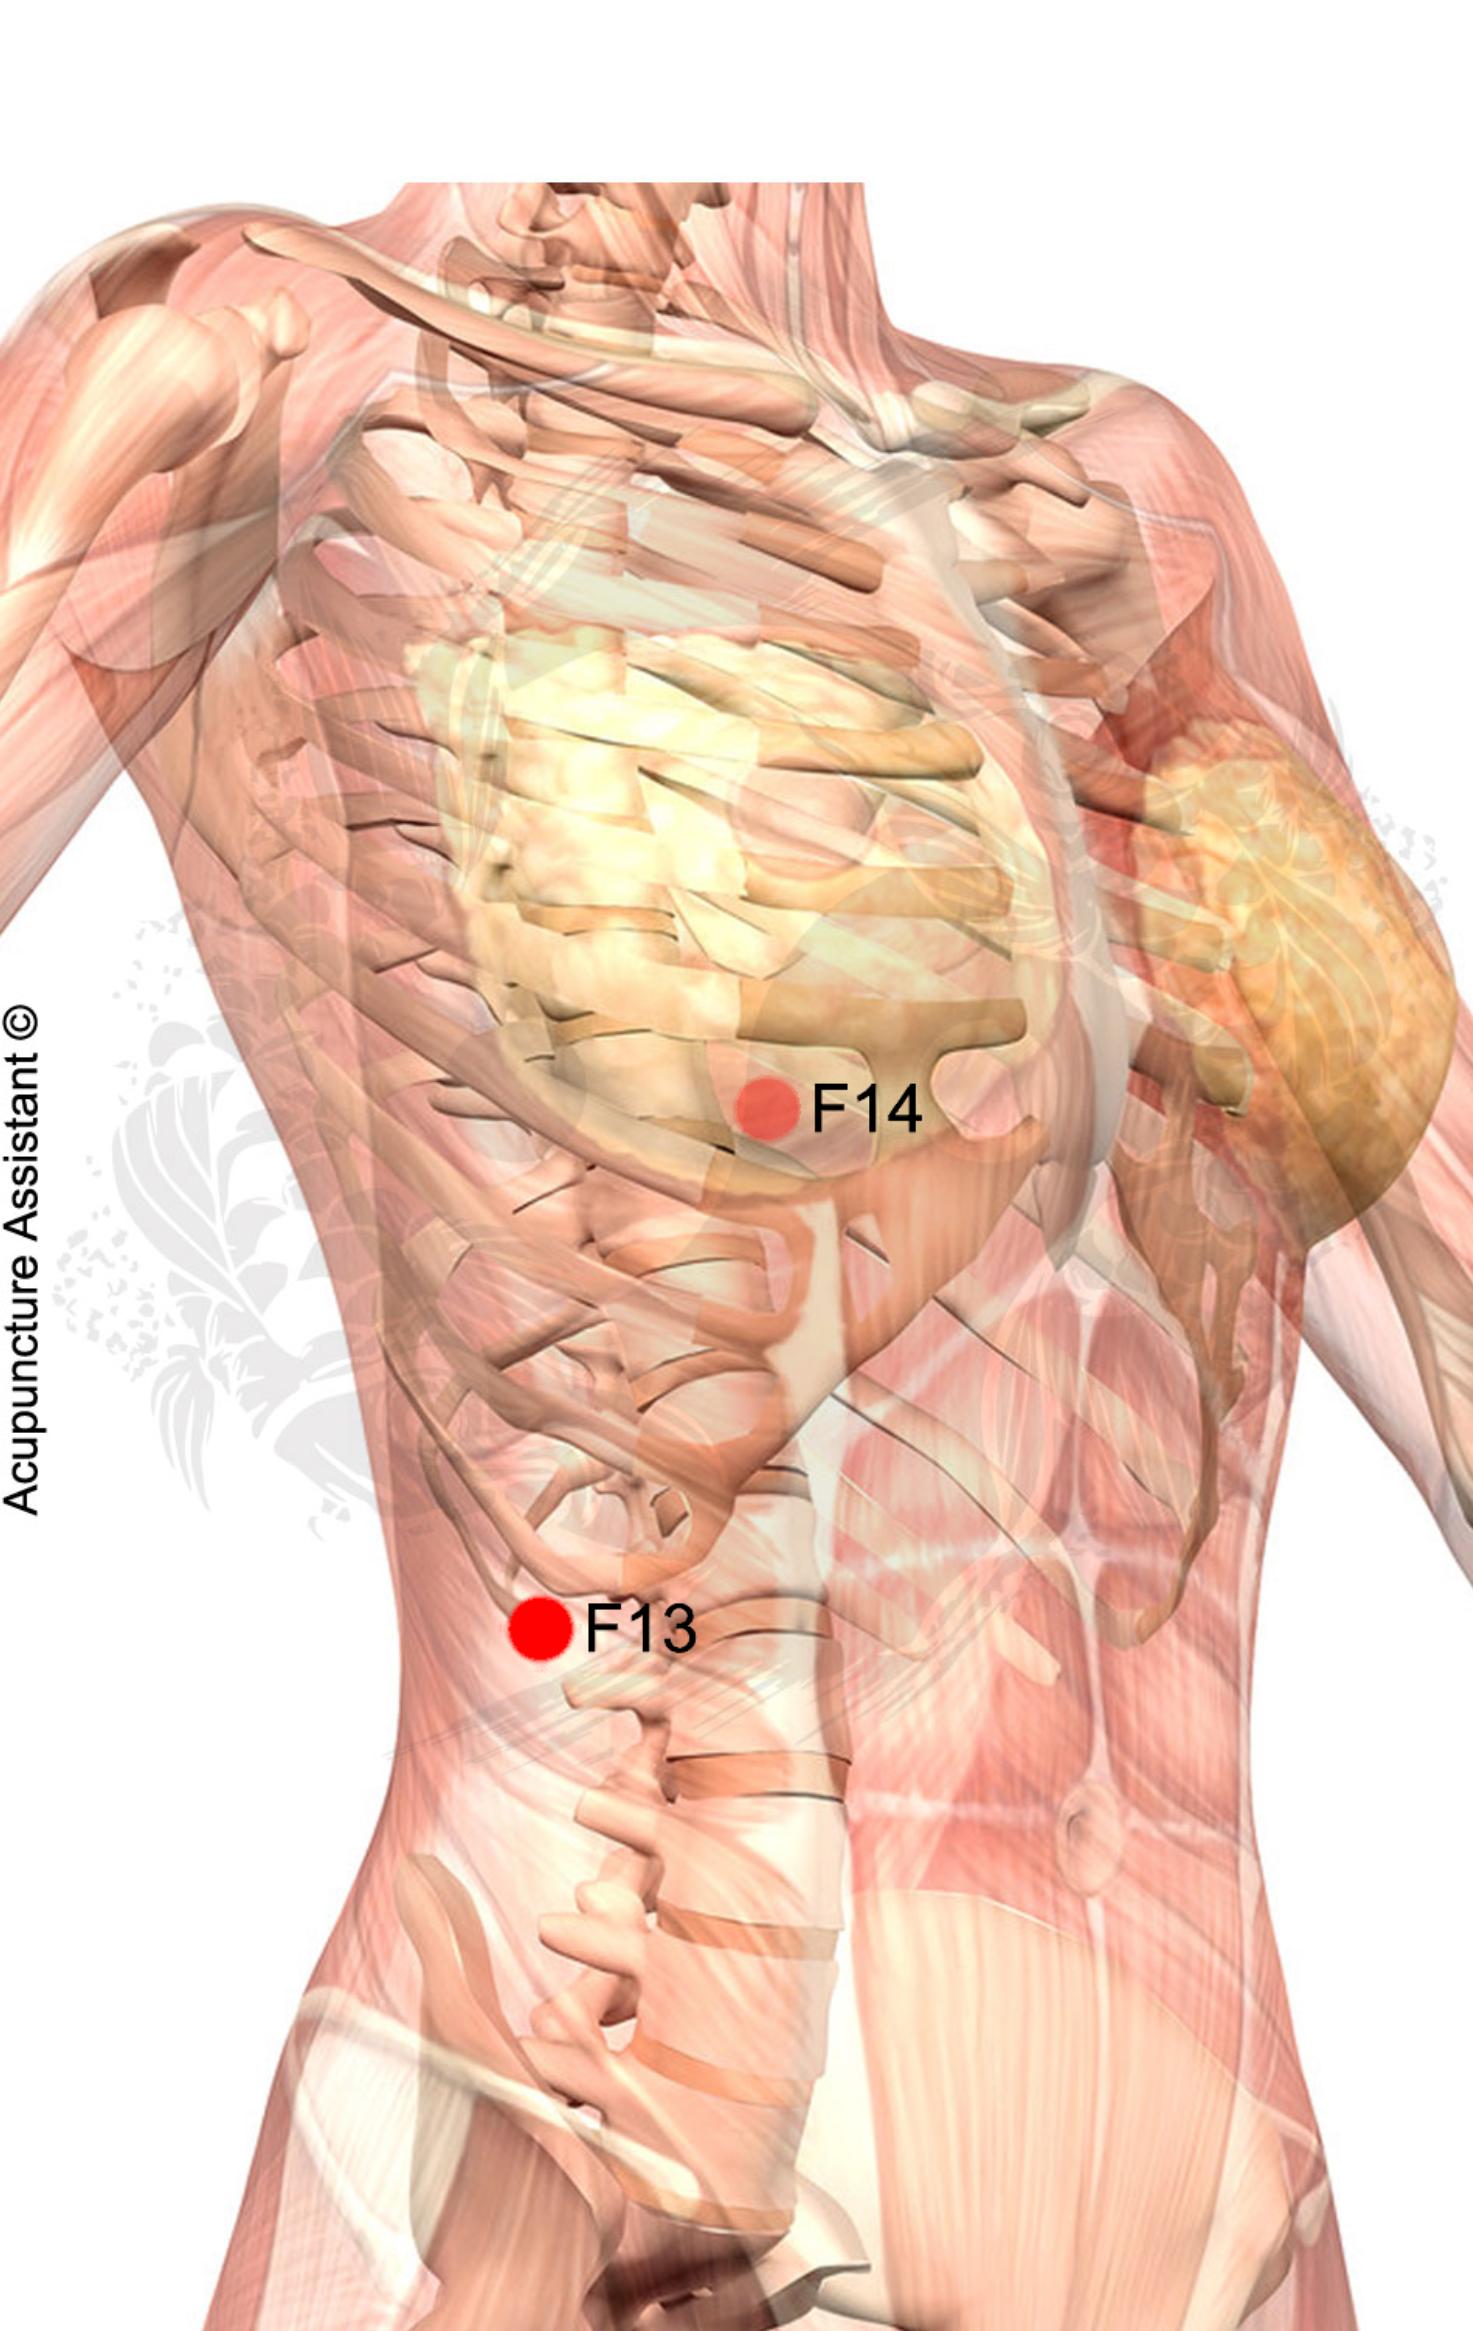 F13-Zhangmen-ponto-de-acupuntura | Bem estar | Pinterest ...